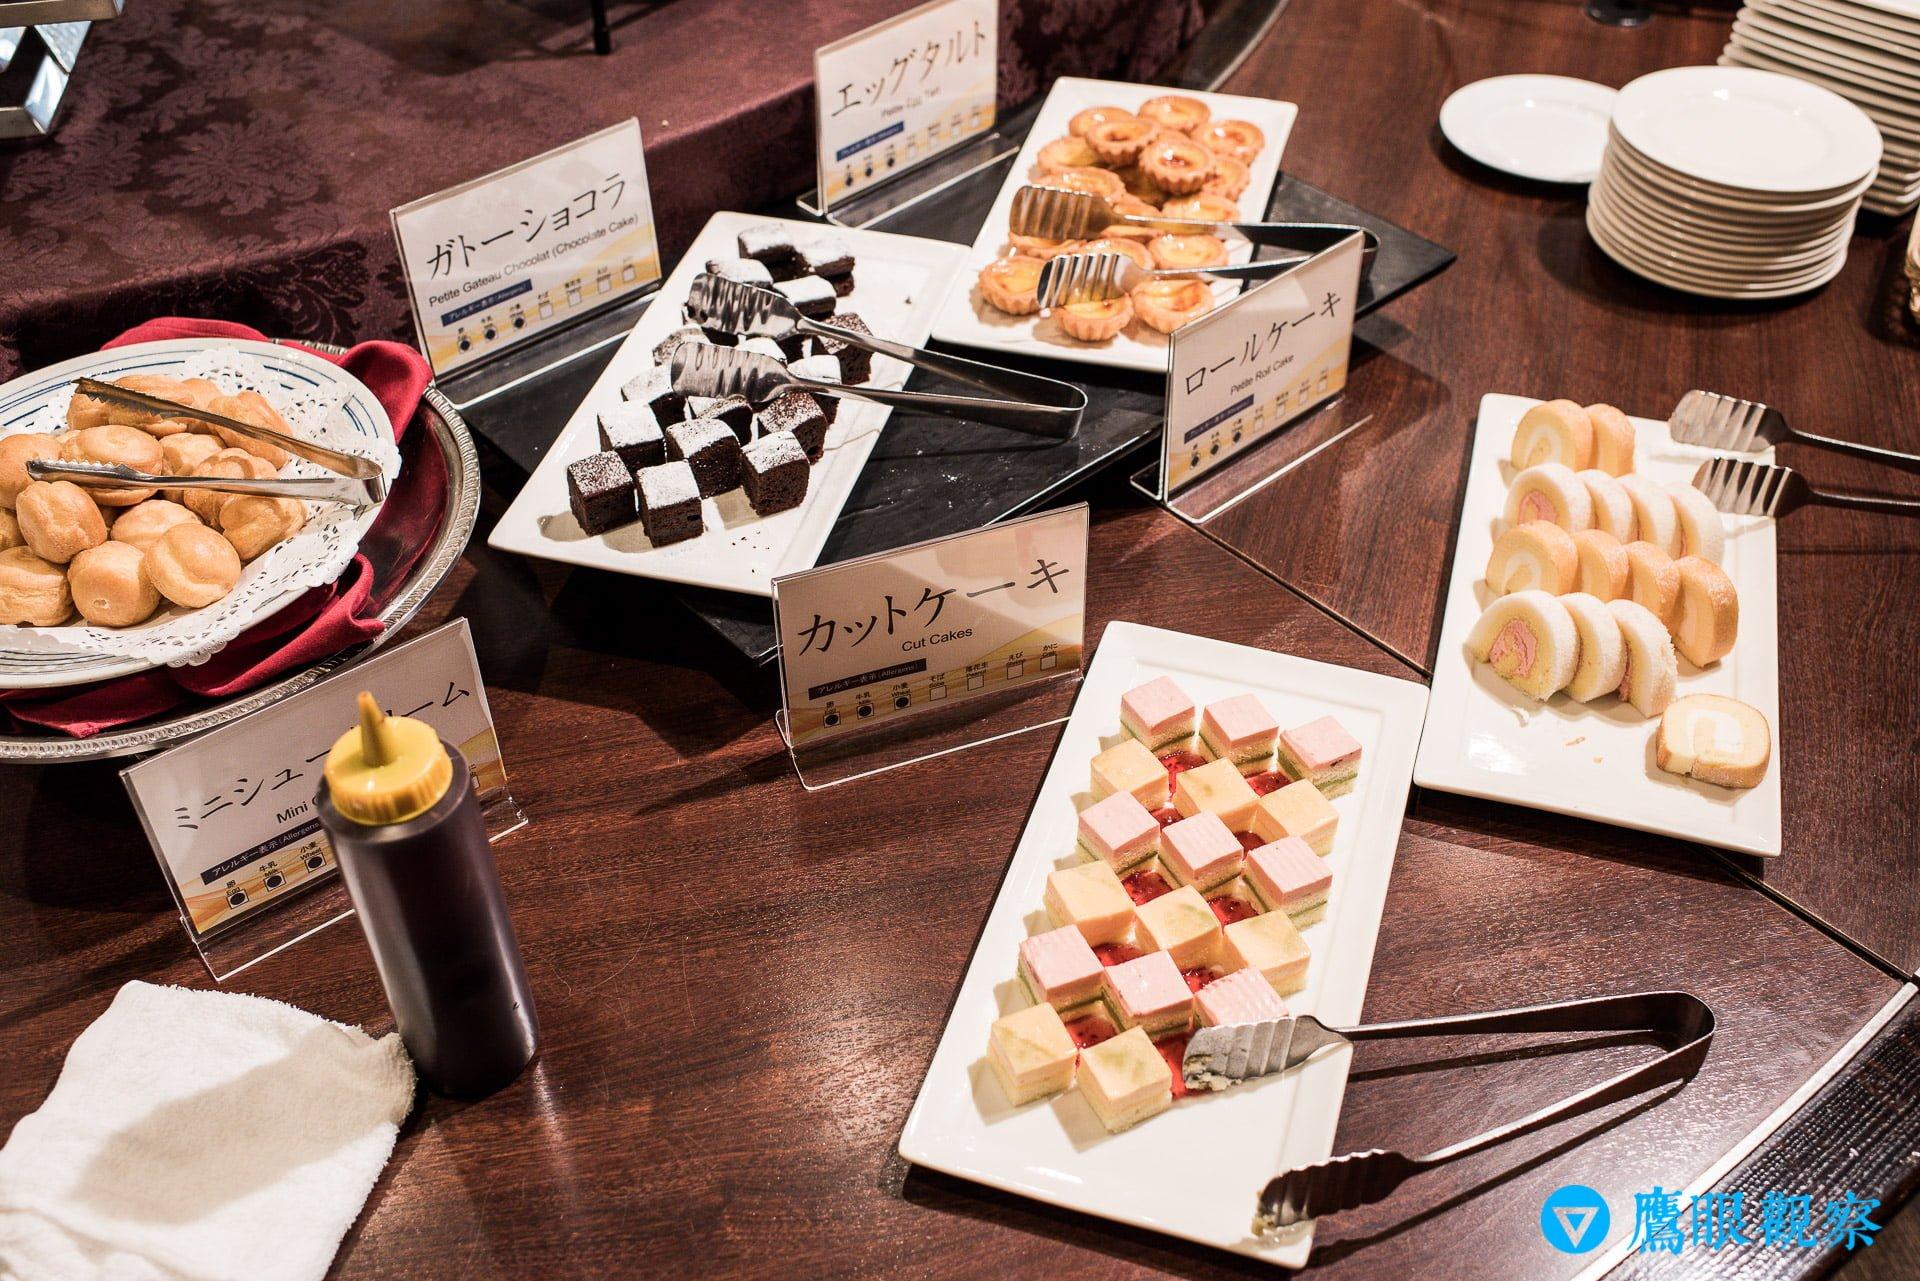 Travel Oarai Hotel in Ibaraki Prefecture Japan 27 日本茨城縣/東茨城/大洗飯店(大洗ホテル)/旅館推薦與住宿旅遊心得分享